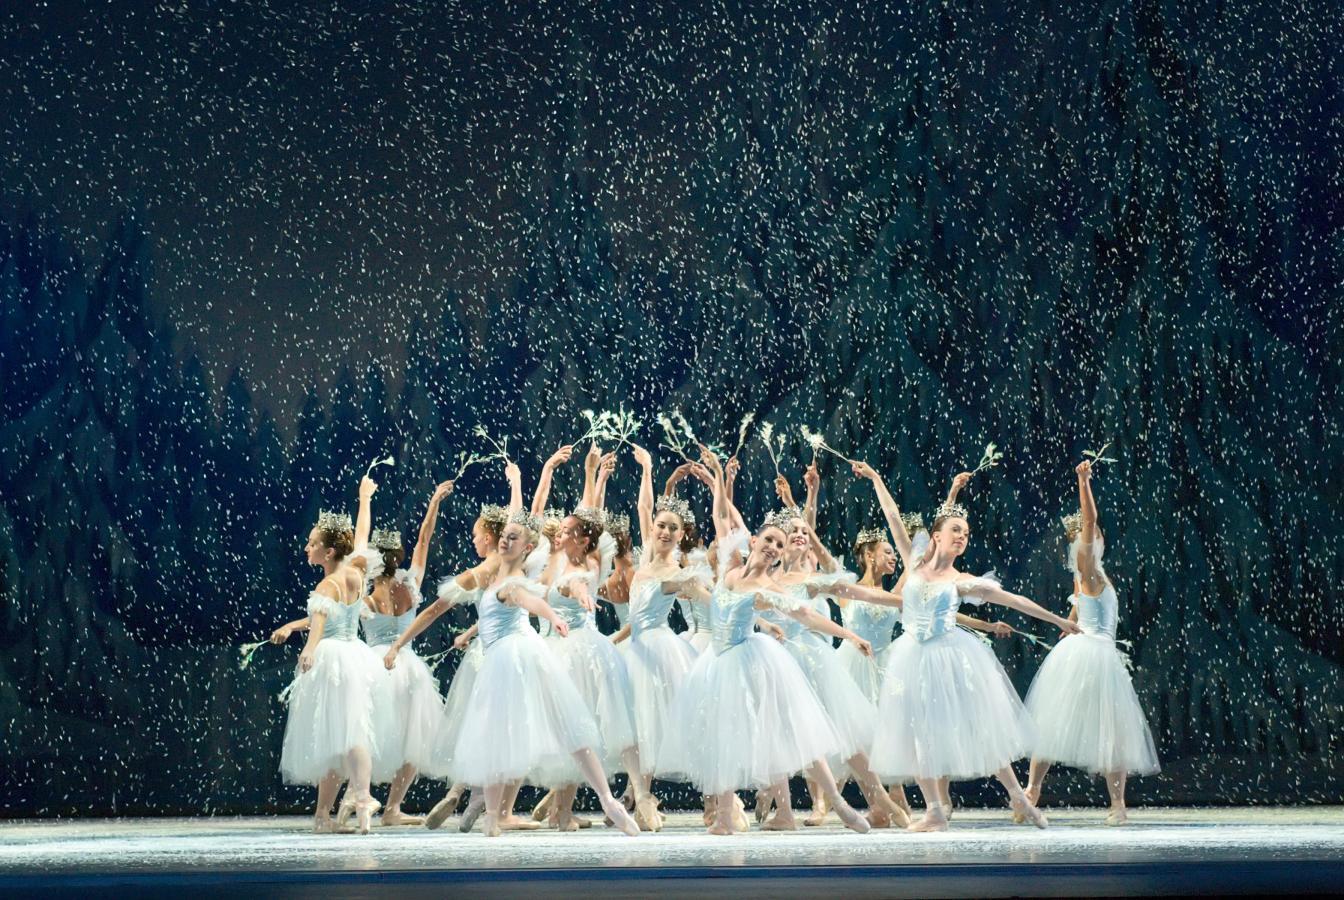 Miami City Ballet's production of George Balanchine's The NutcrackerTM.  Choreography by George Bala